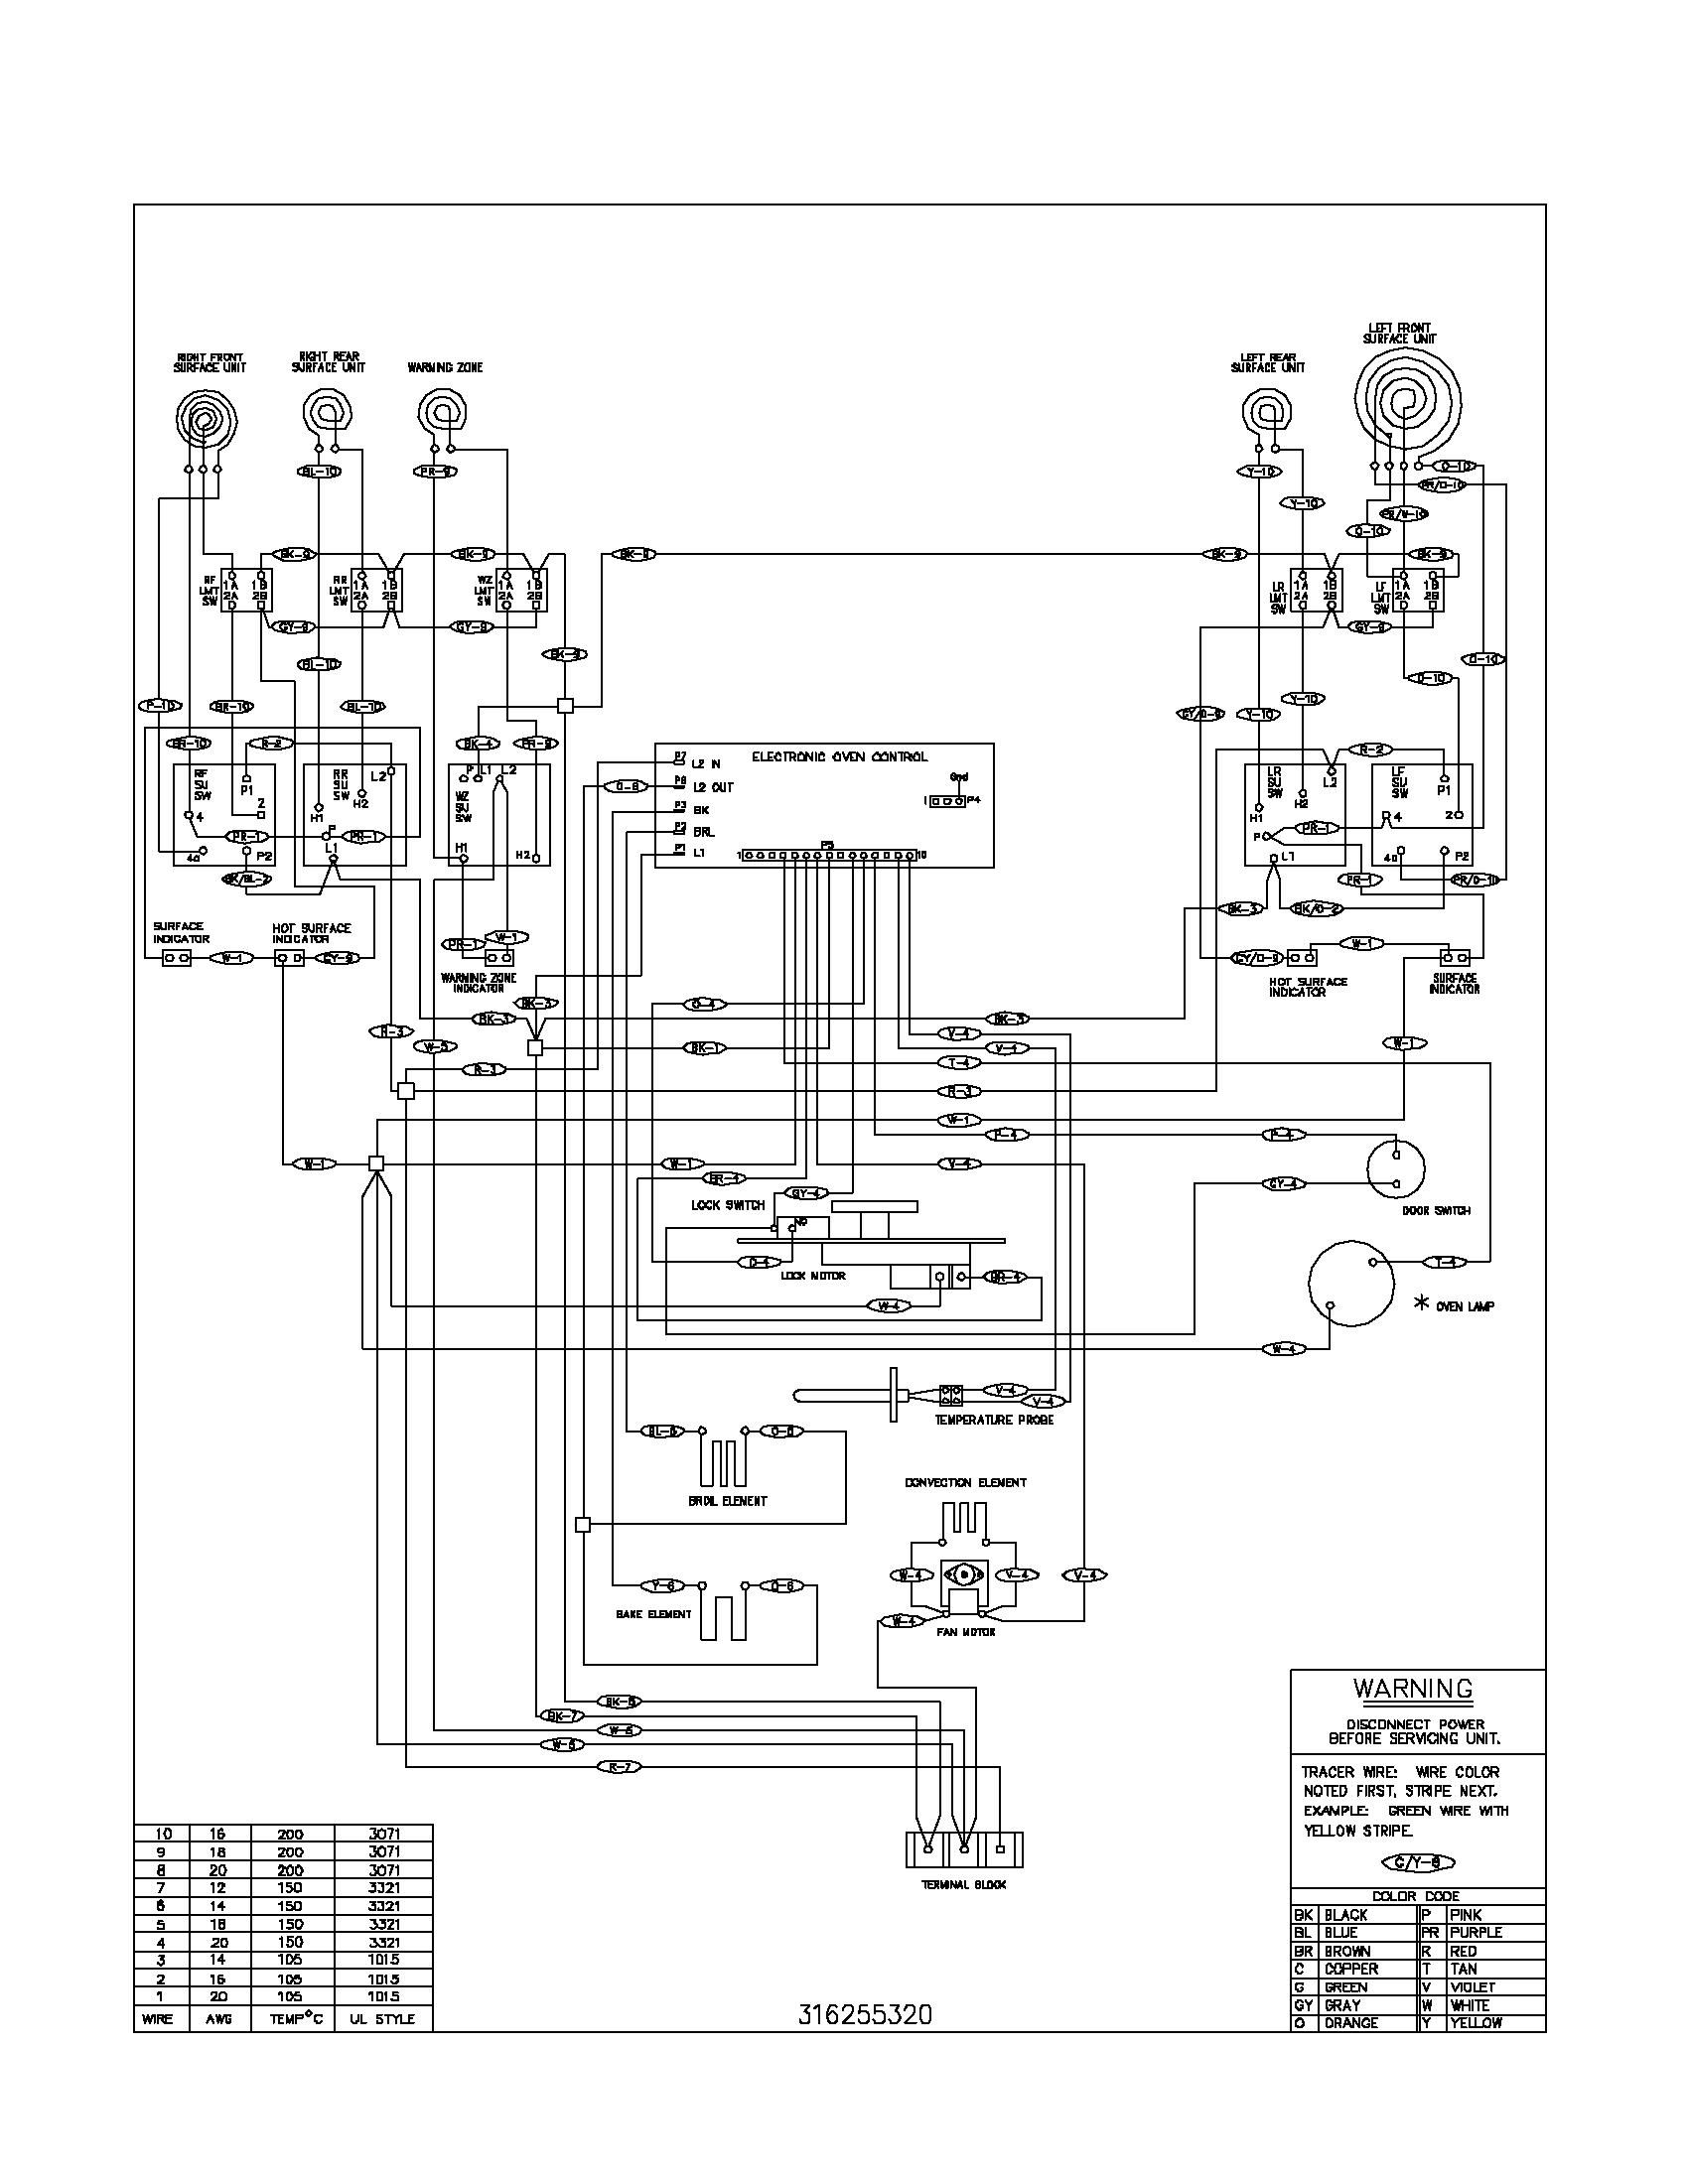 Pleasing Whirlpool Microwave Wiring Diagram Wiring Diagram Data Wiring Cloud Rineaidewilluminateatxorg